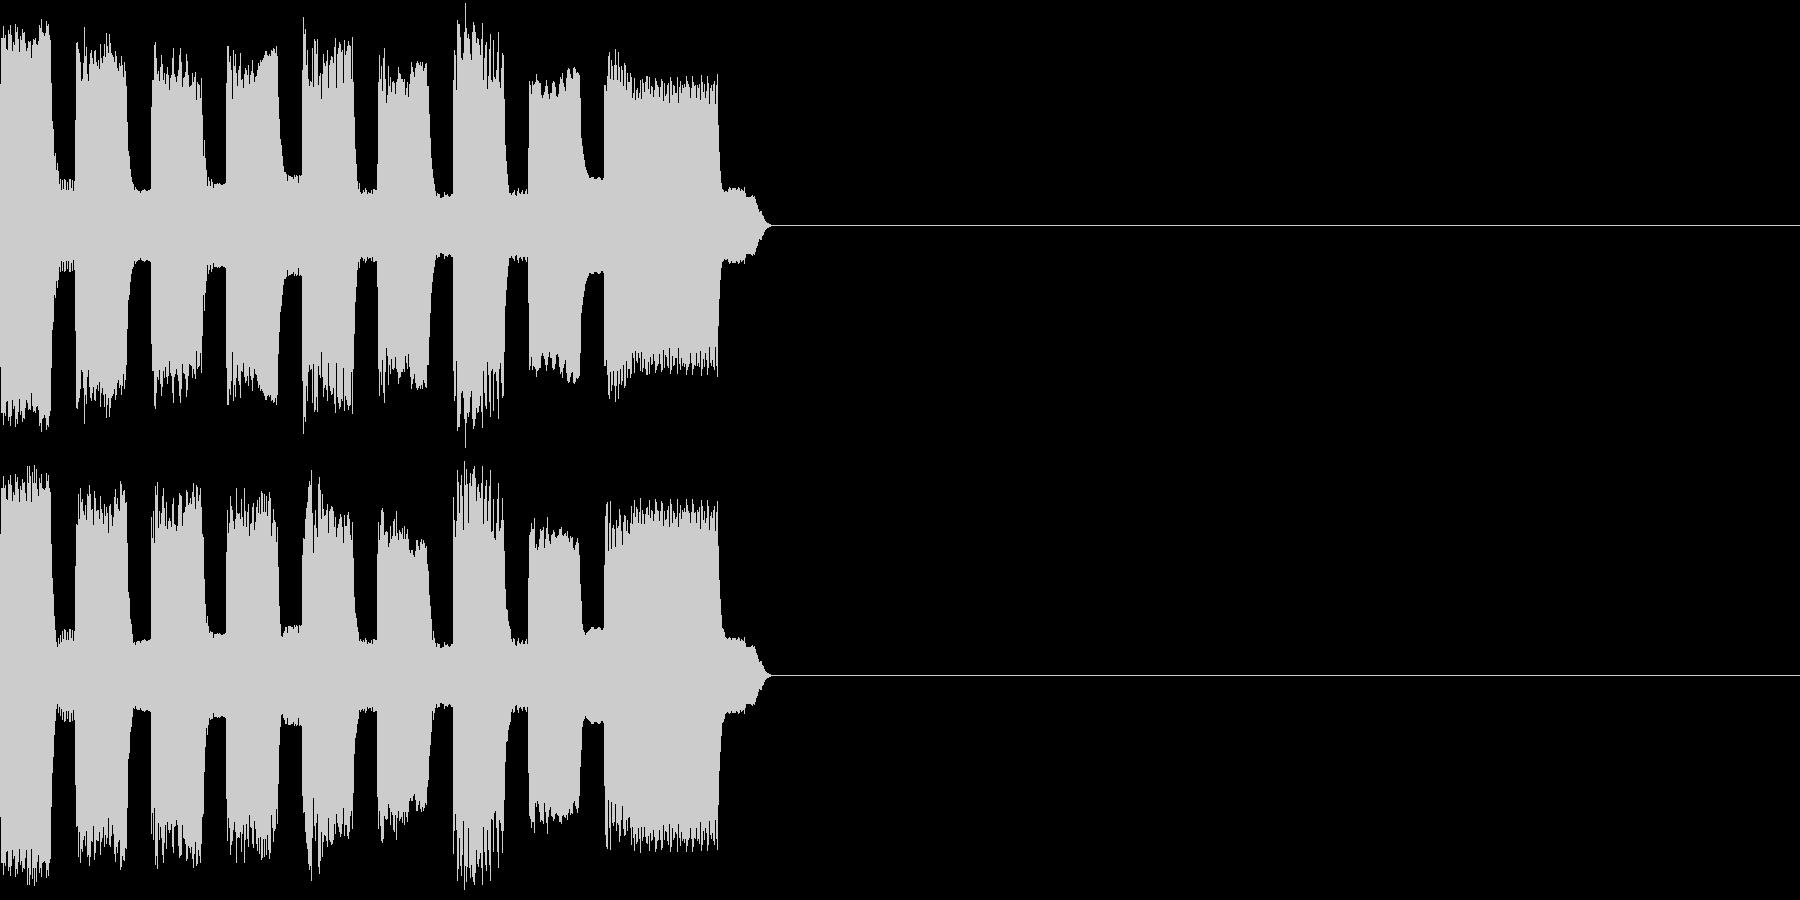 RetroGame 巨大化効果音の未再生の波形